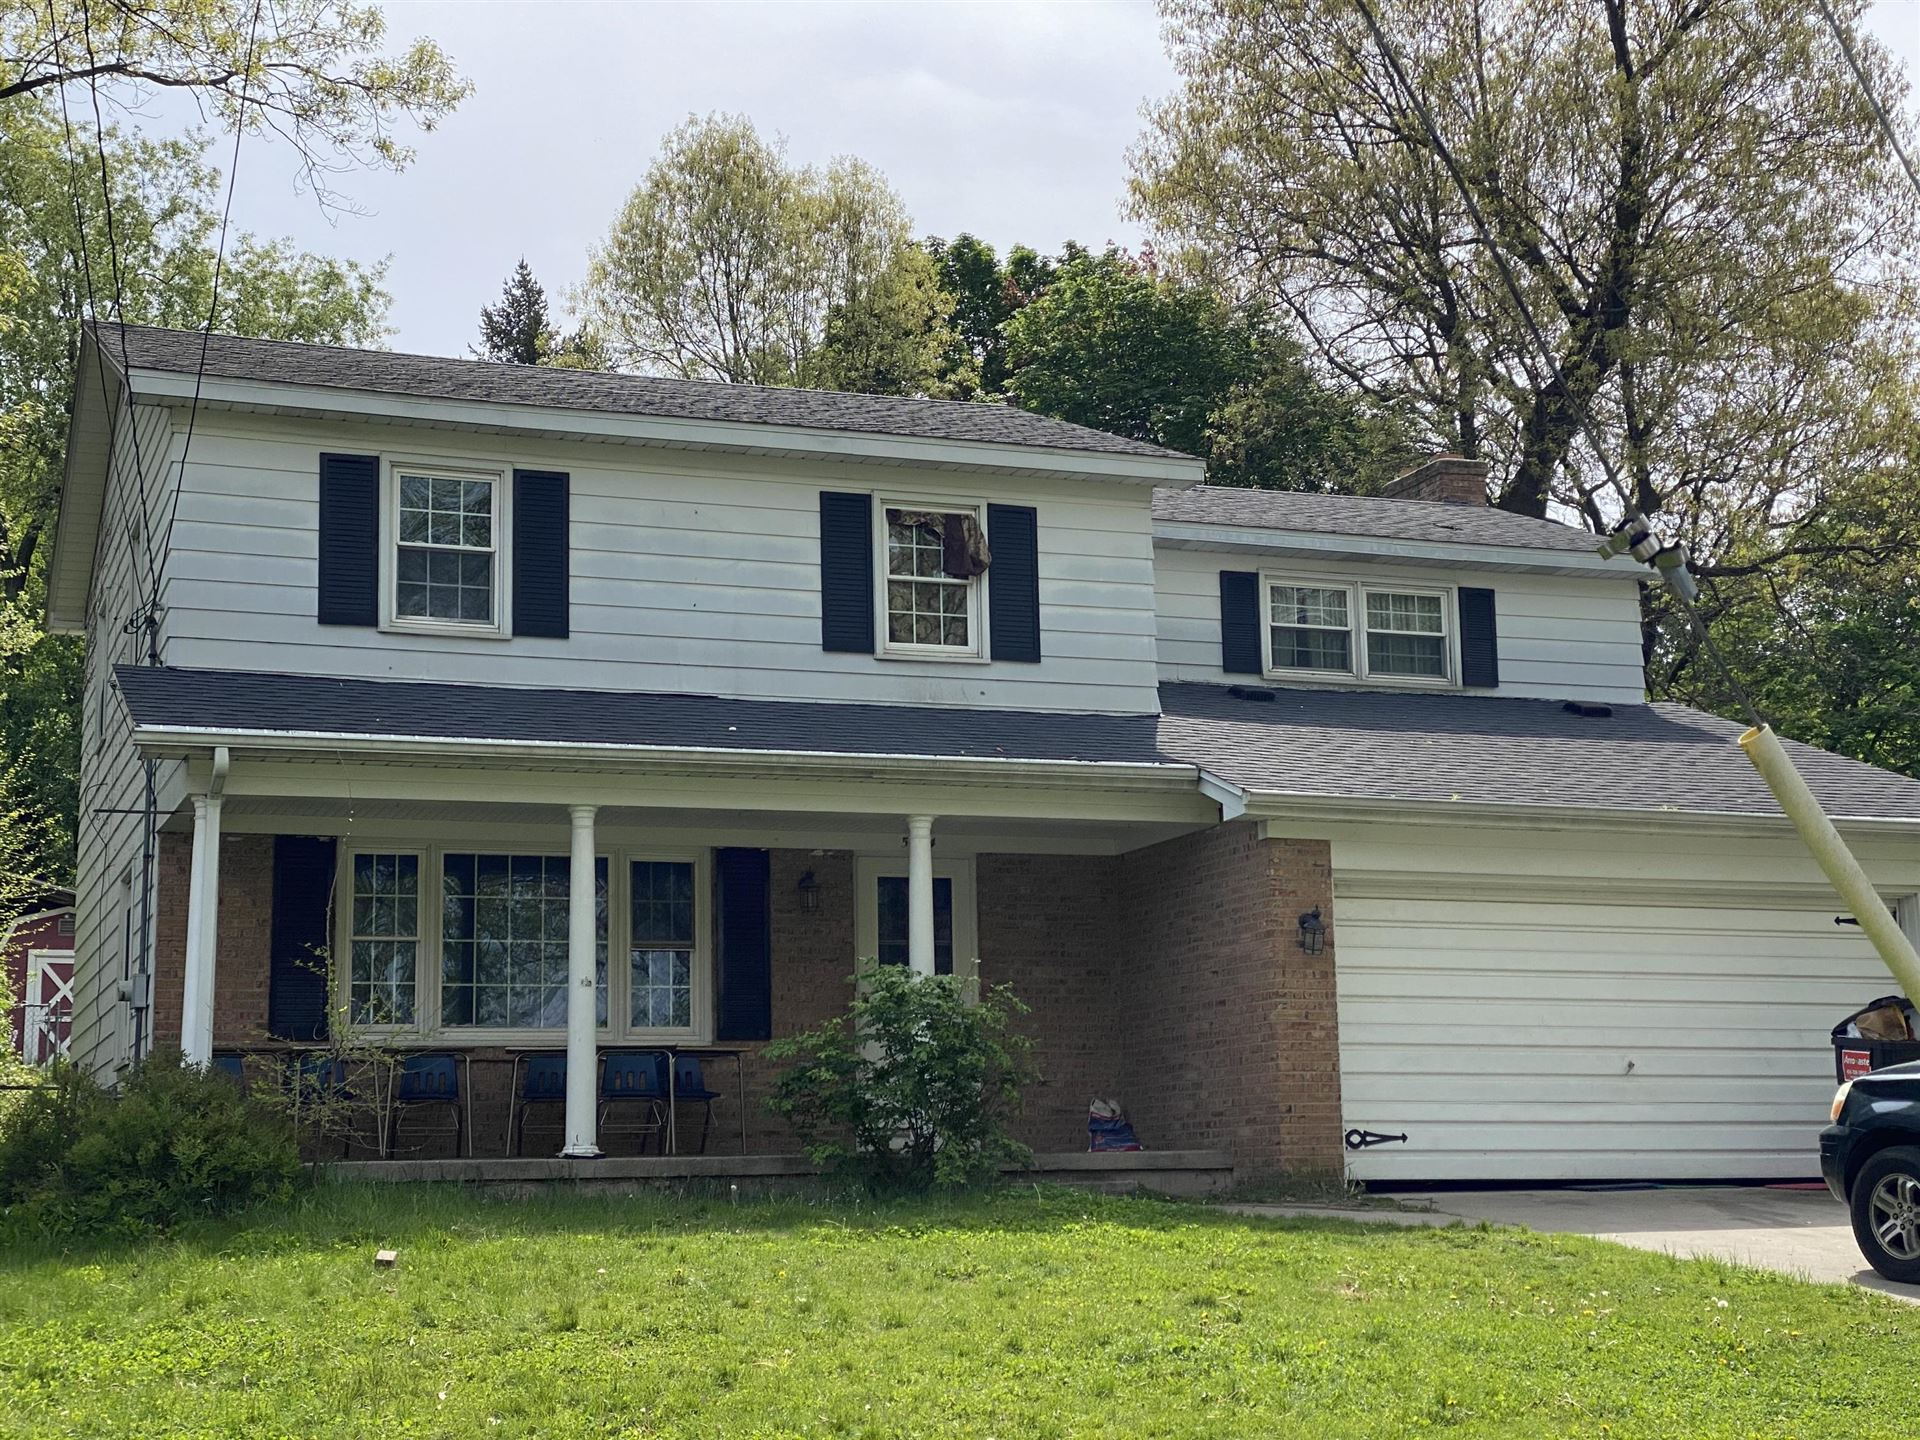 5854 Burgis Avenue SE, Kentwood, MI 49508 - MLS#: 21017582